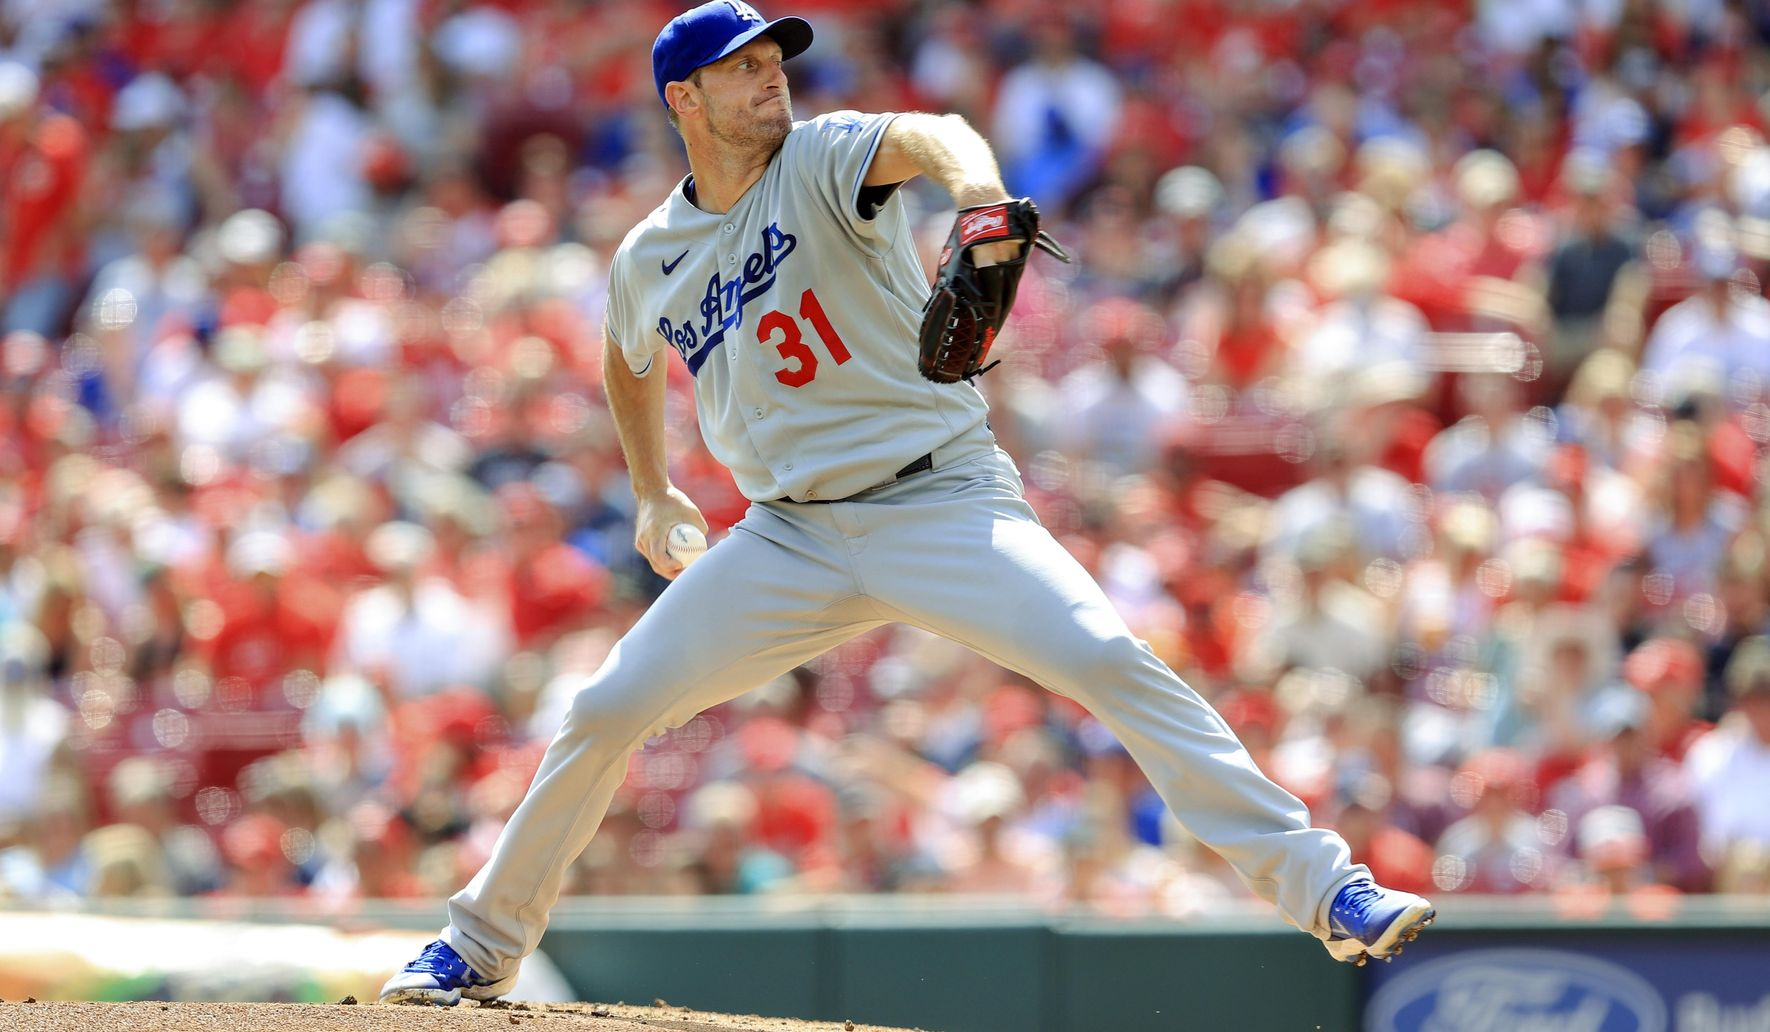 Dodgers_reds_baseball_39048_c0-207-4957-3097_s1770x1032